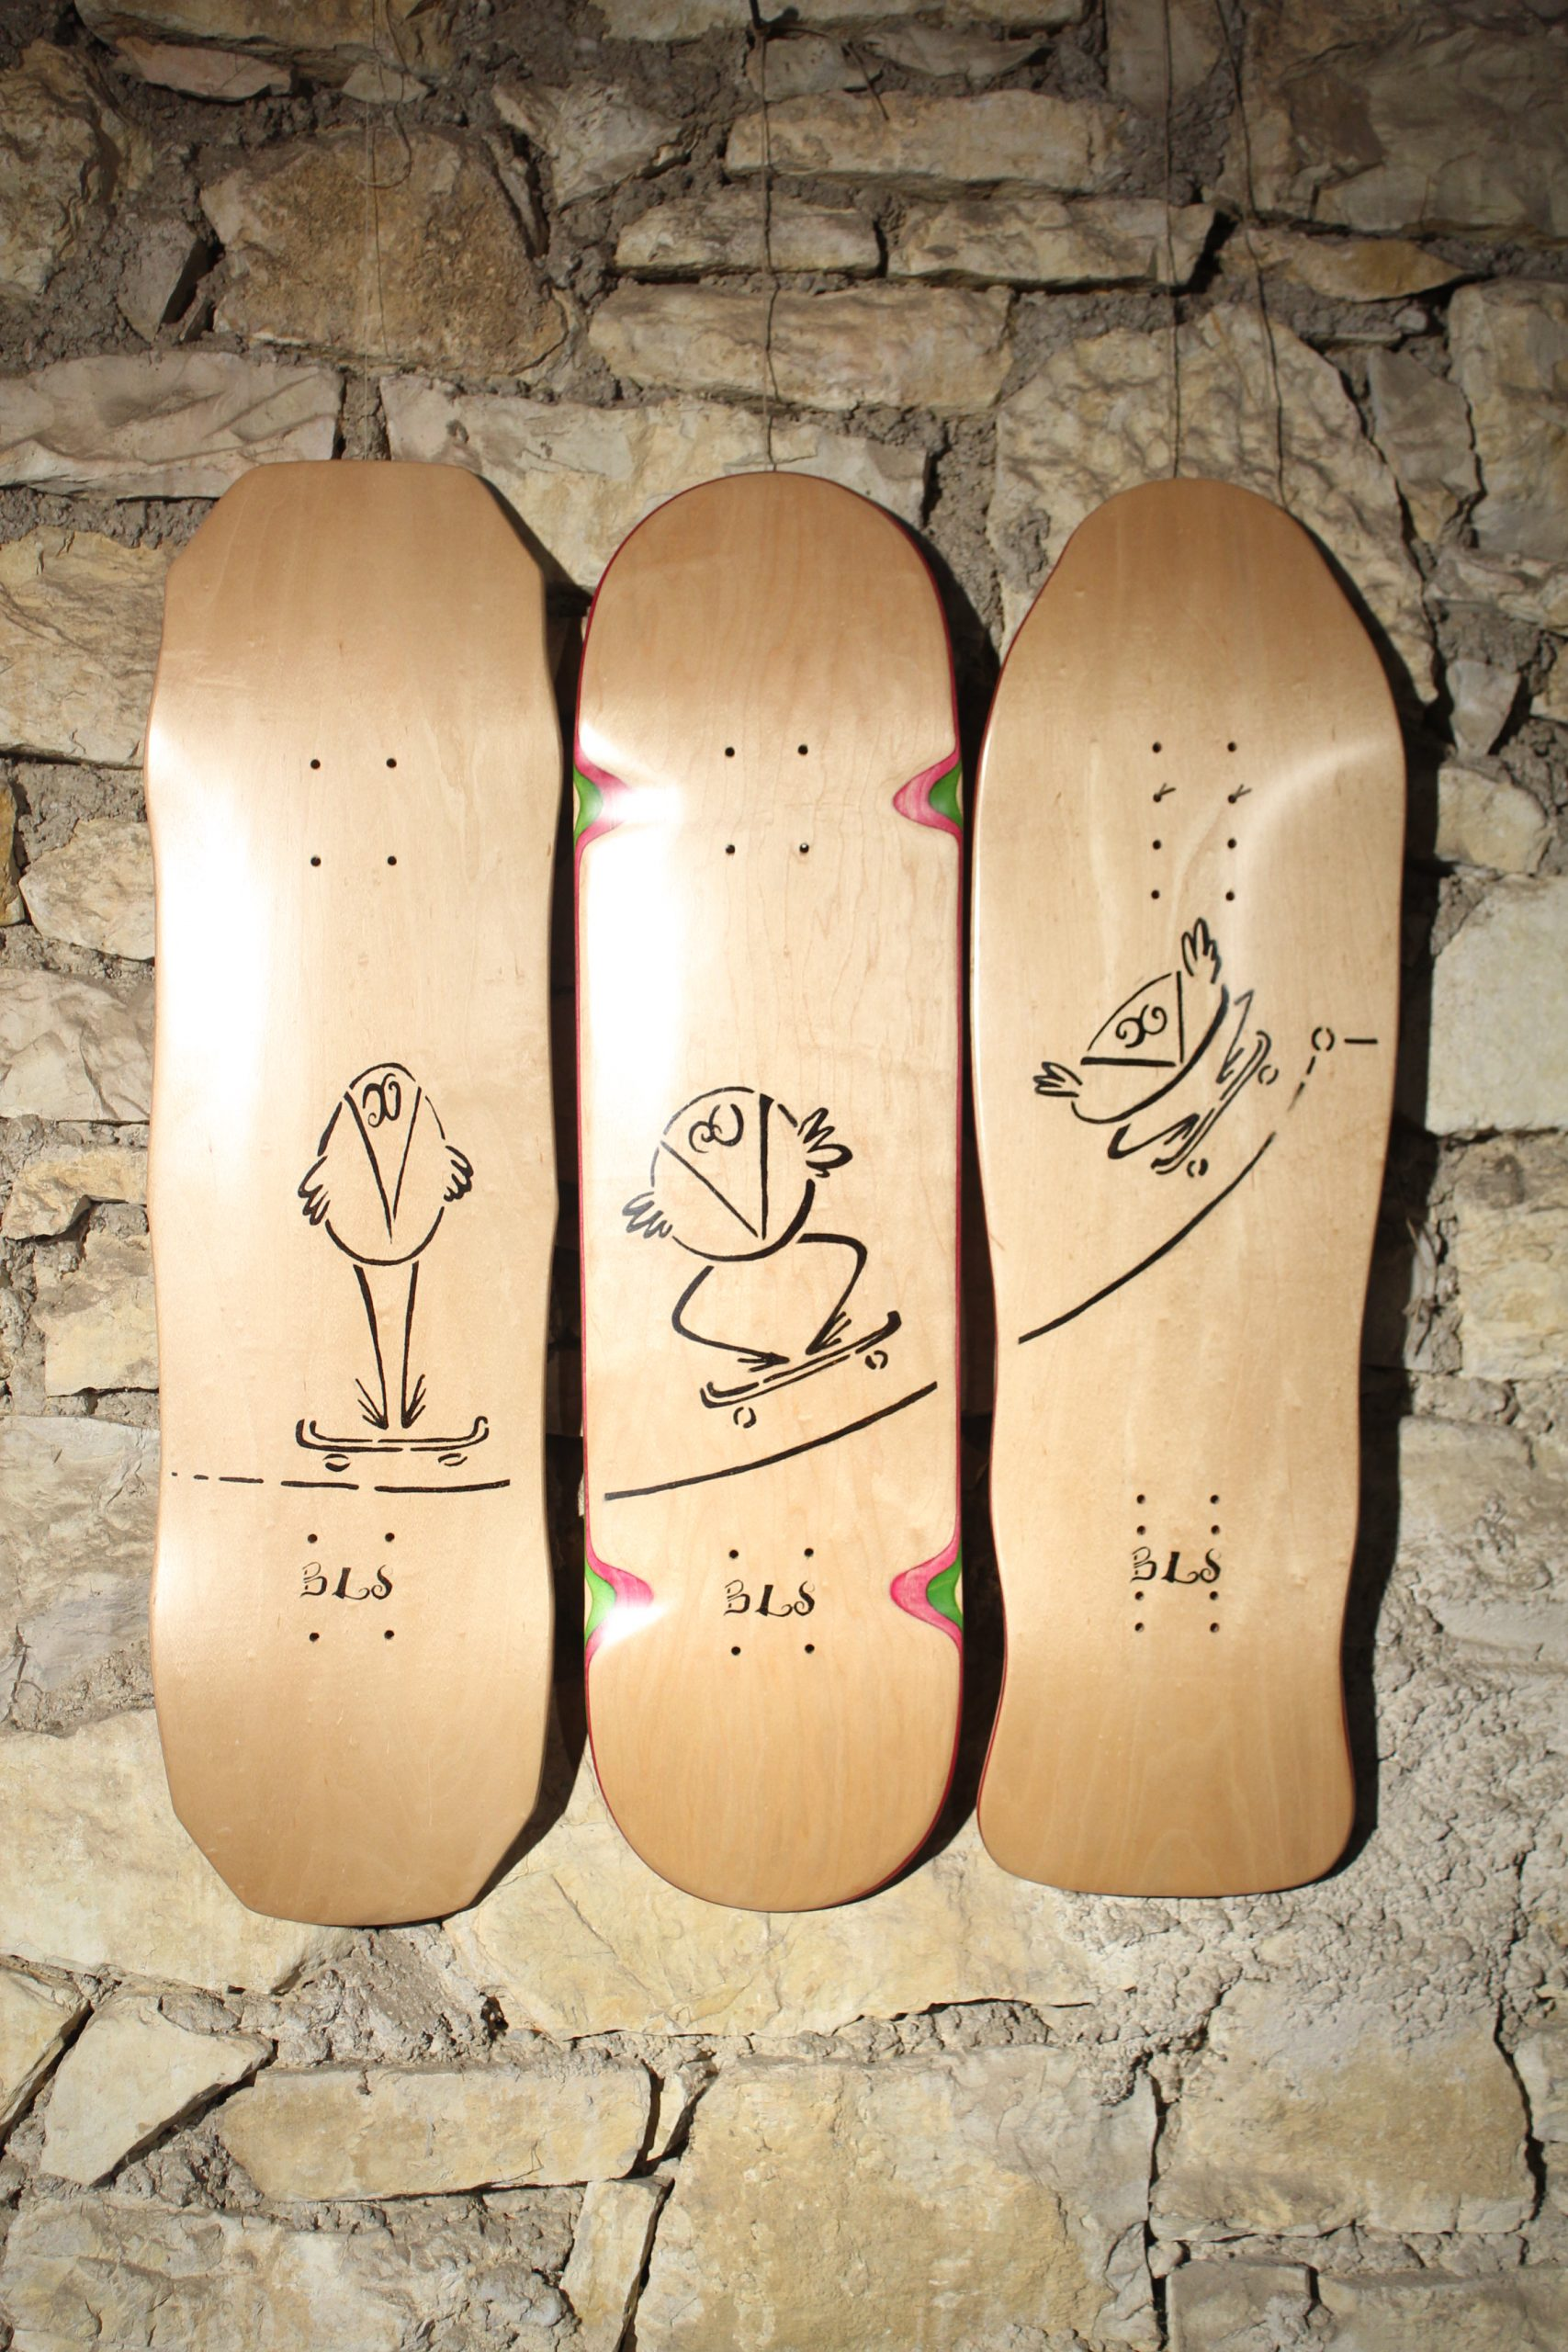 Shaper of the month – Boarder line skateboard